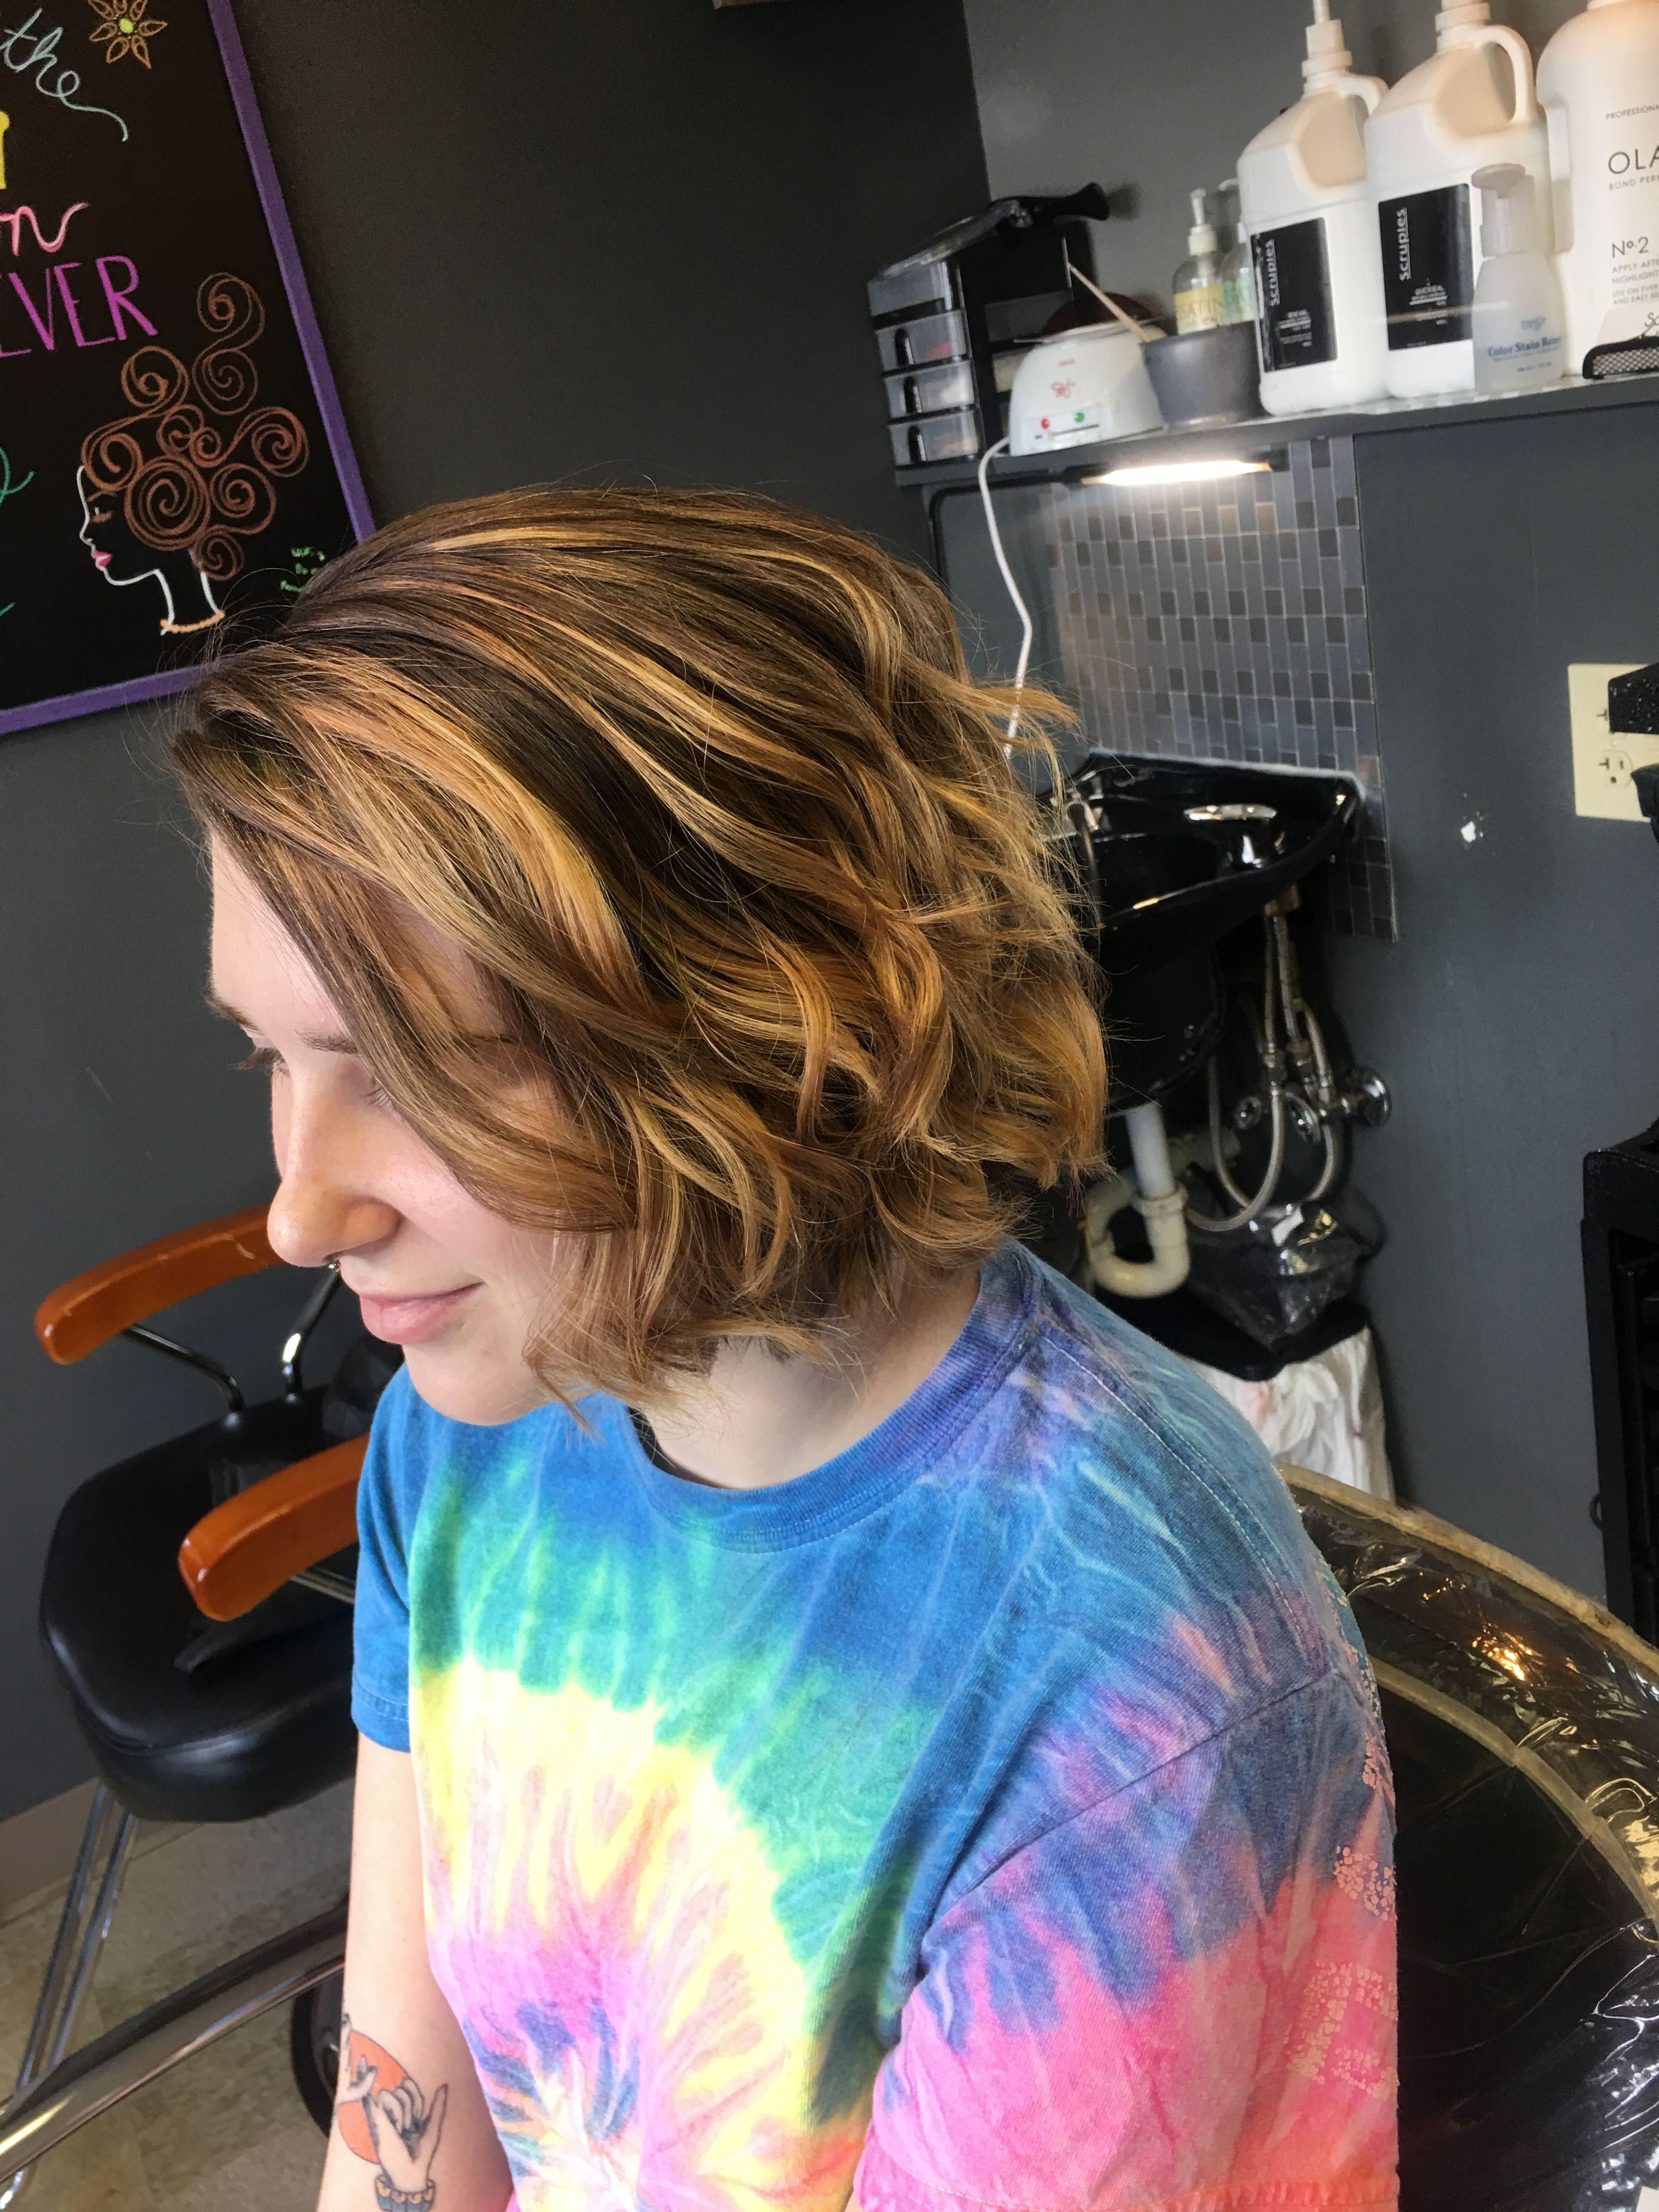 Beautiful brown into carnal Balayage bob. Above the shoulder length hair is a cute fun cut to rock!